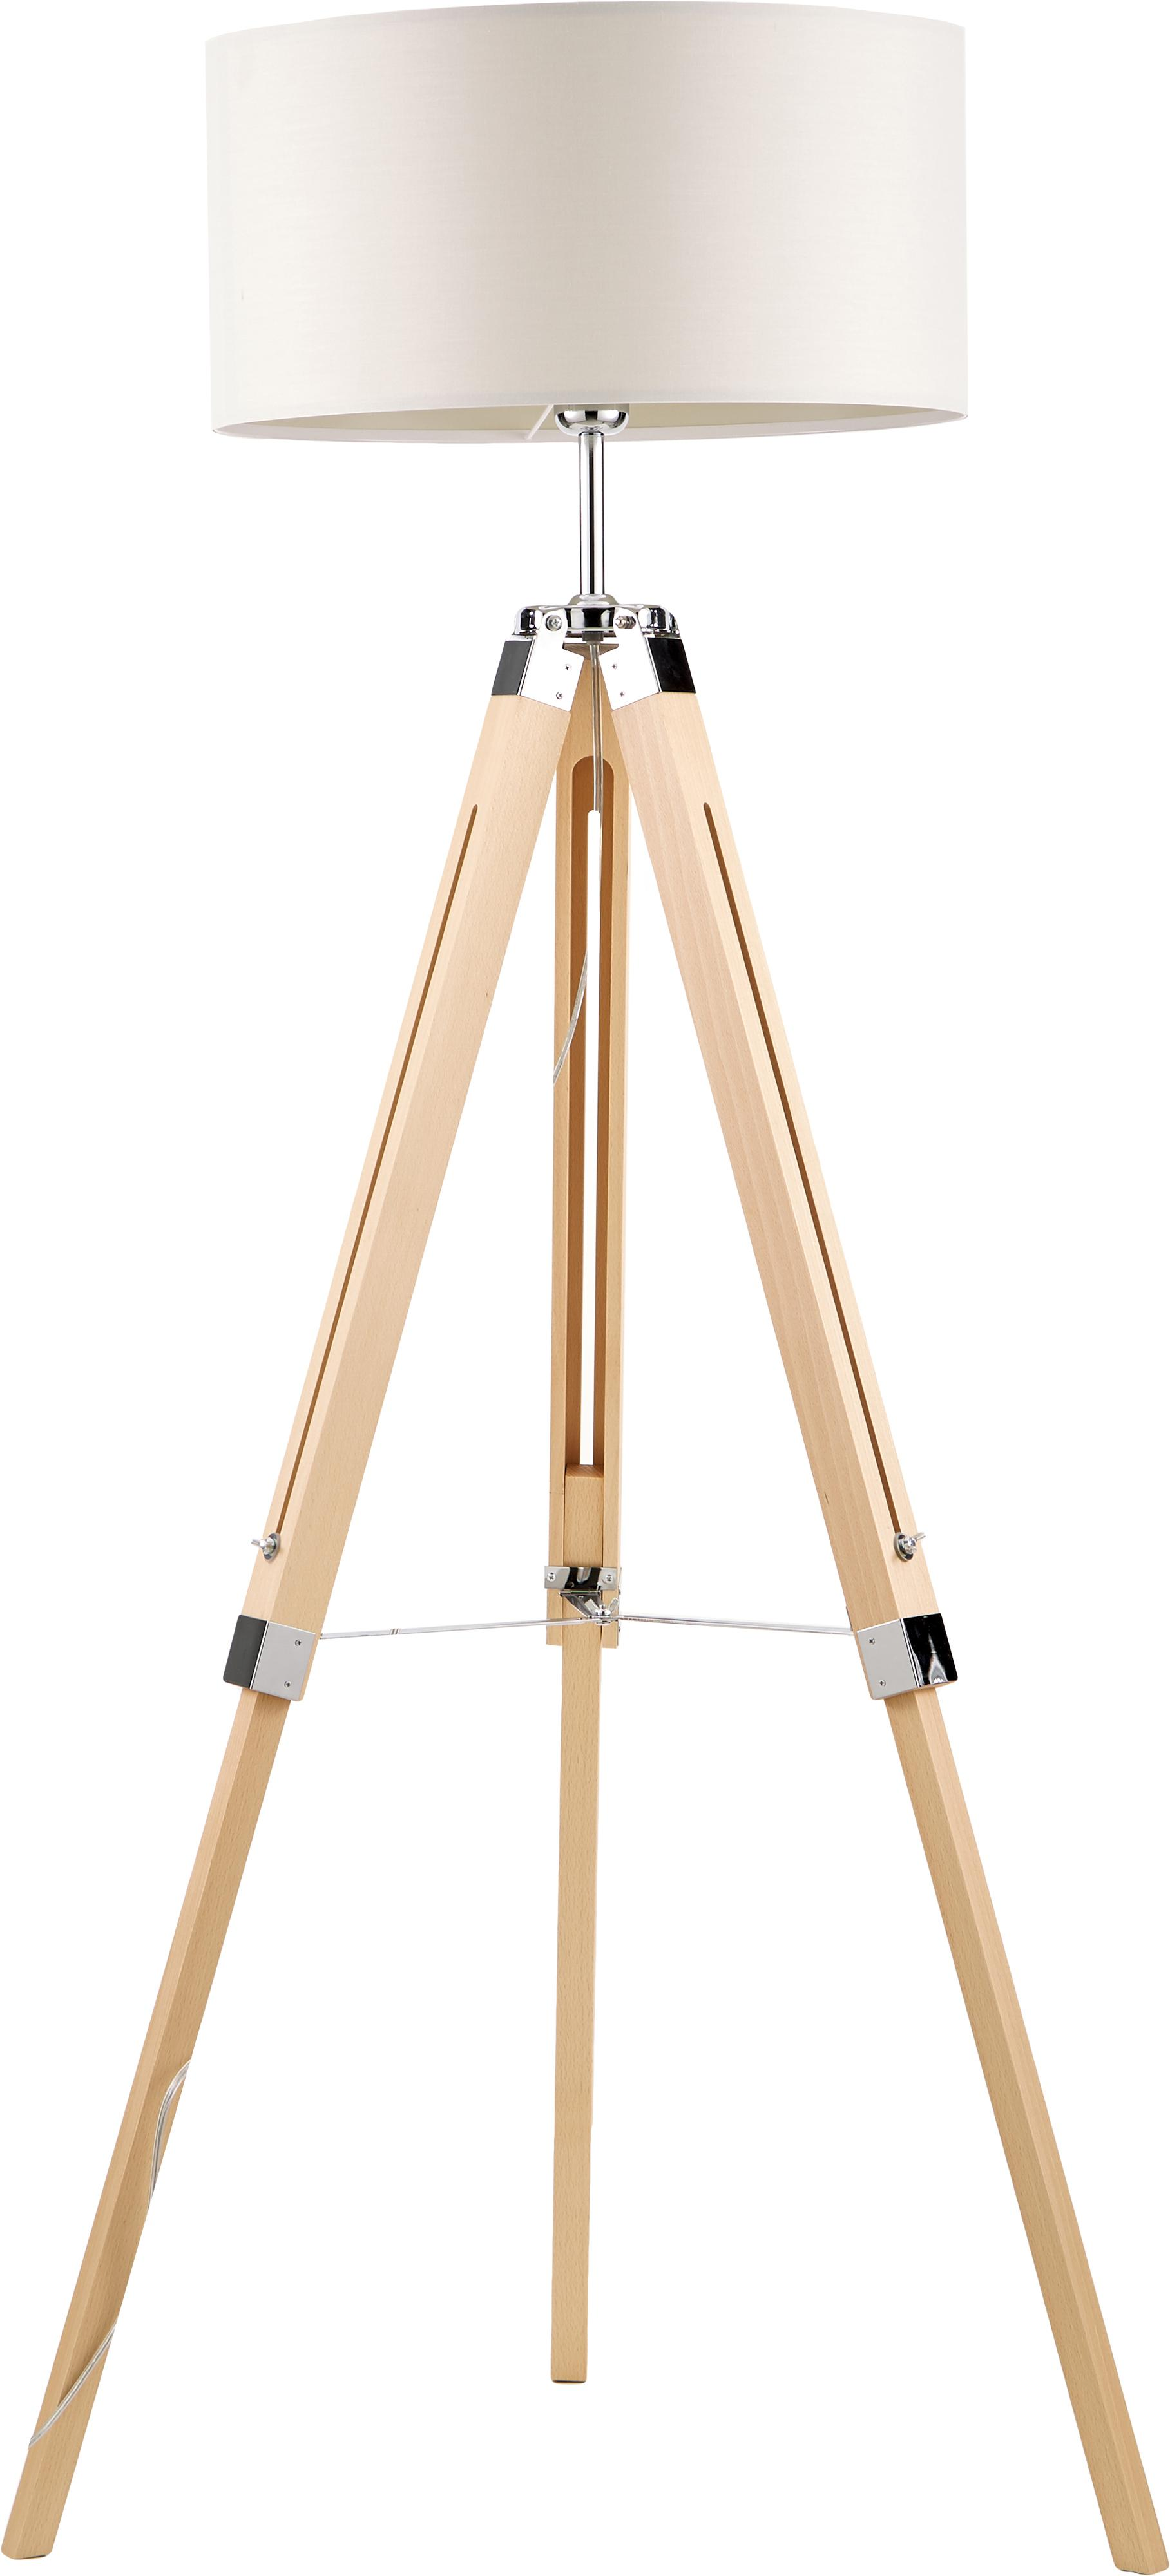 Lámpara de pie tripode Lantada, Pantalla: tela, Cable: plástico, Crema, marrón, Ø 70 x Al 150 cm